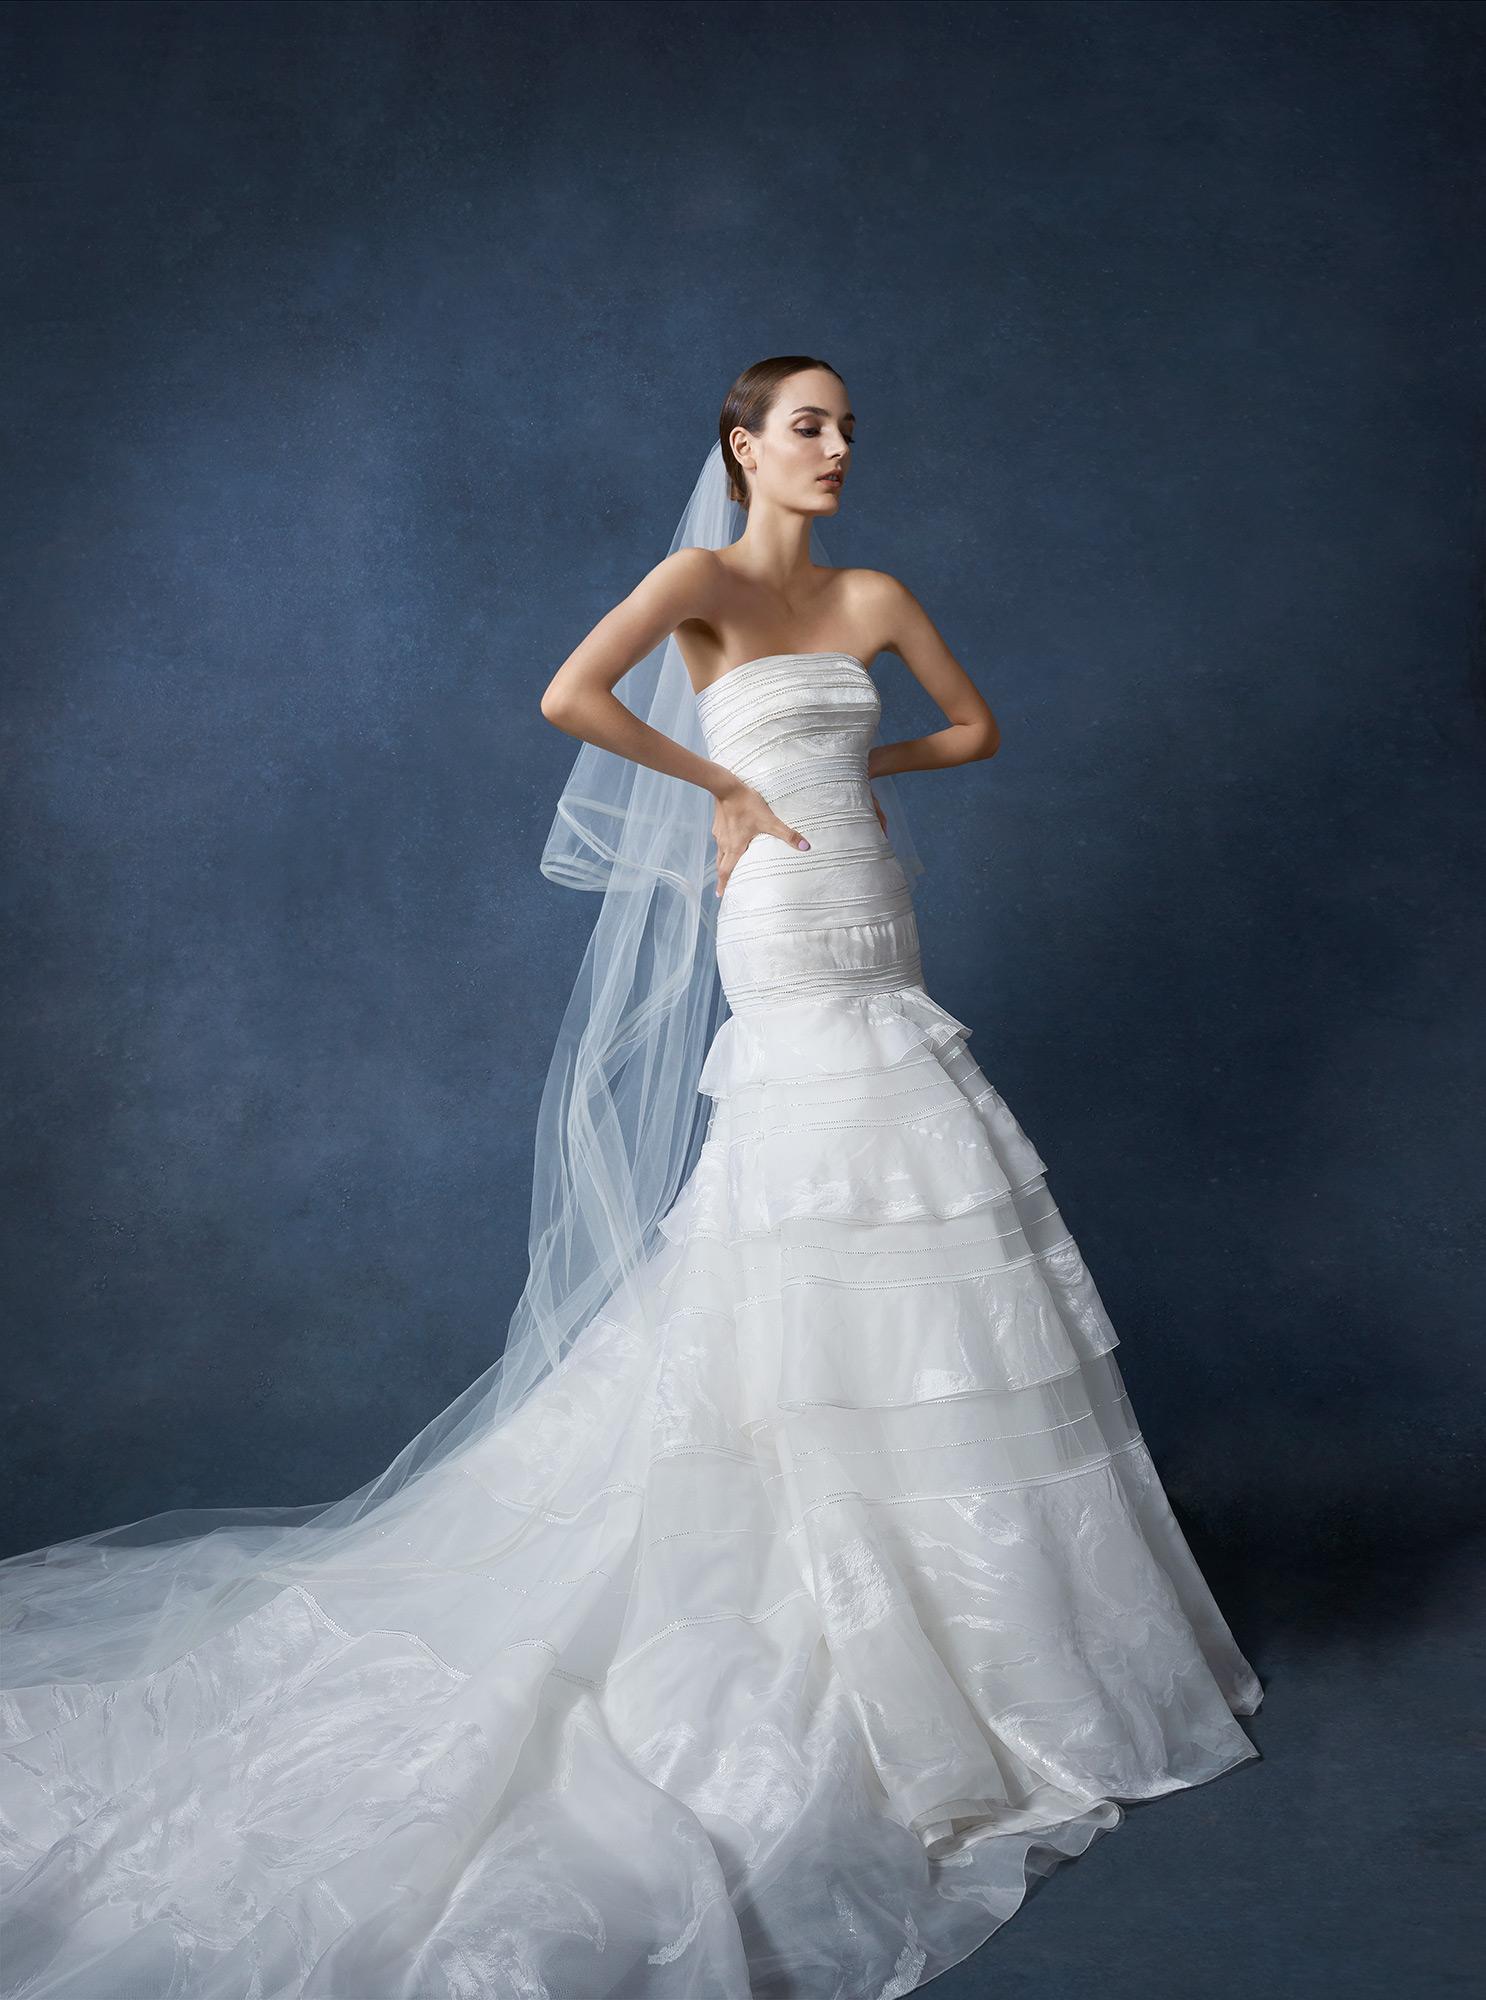 Bridal001_2000-03a.jpg